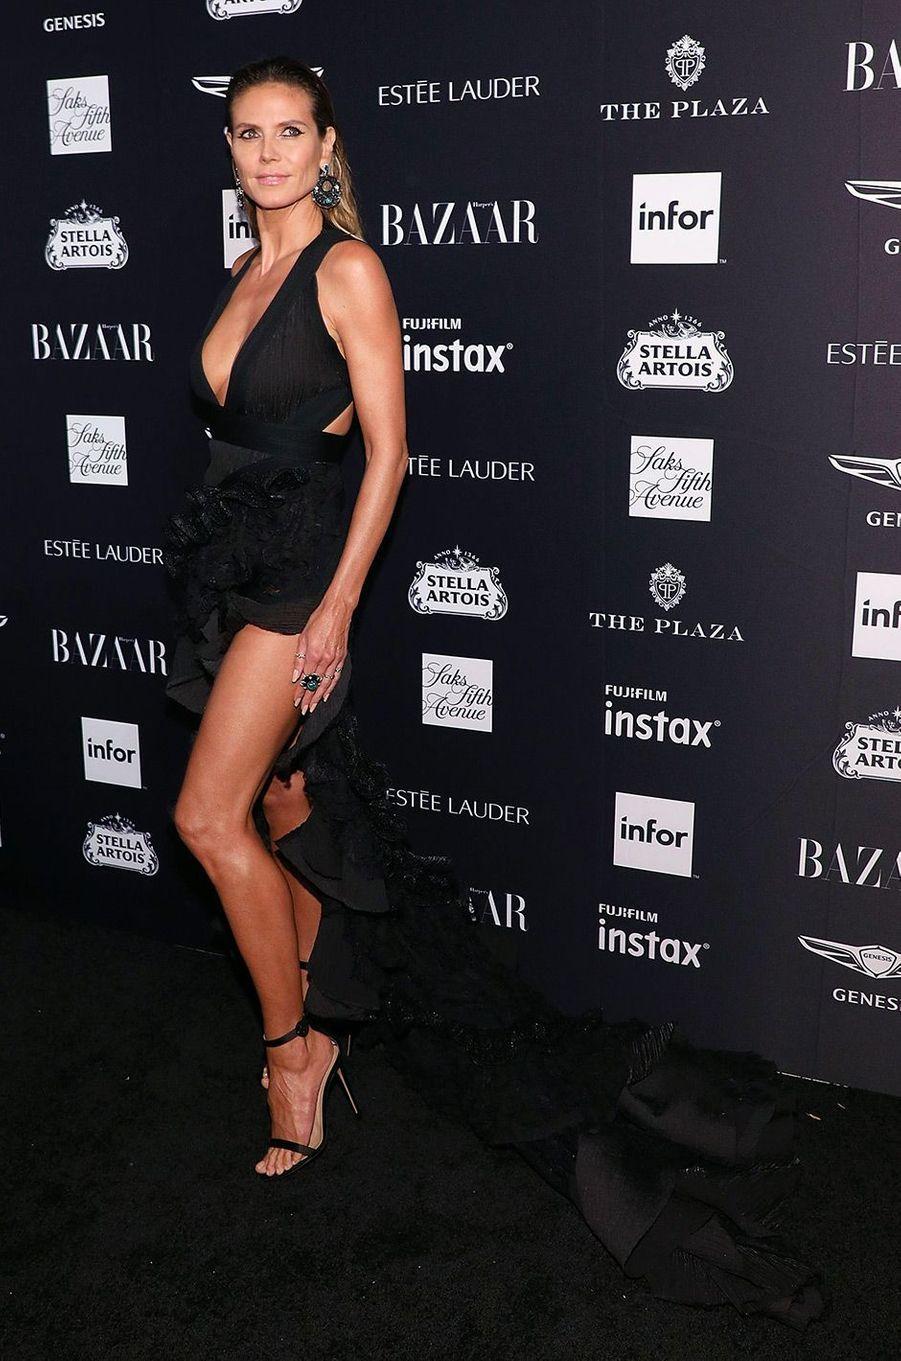 Heidi Klum à la soirée Harper's Bazaar Icons, vendredi 7 septembre